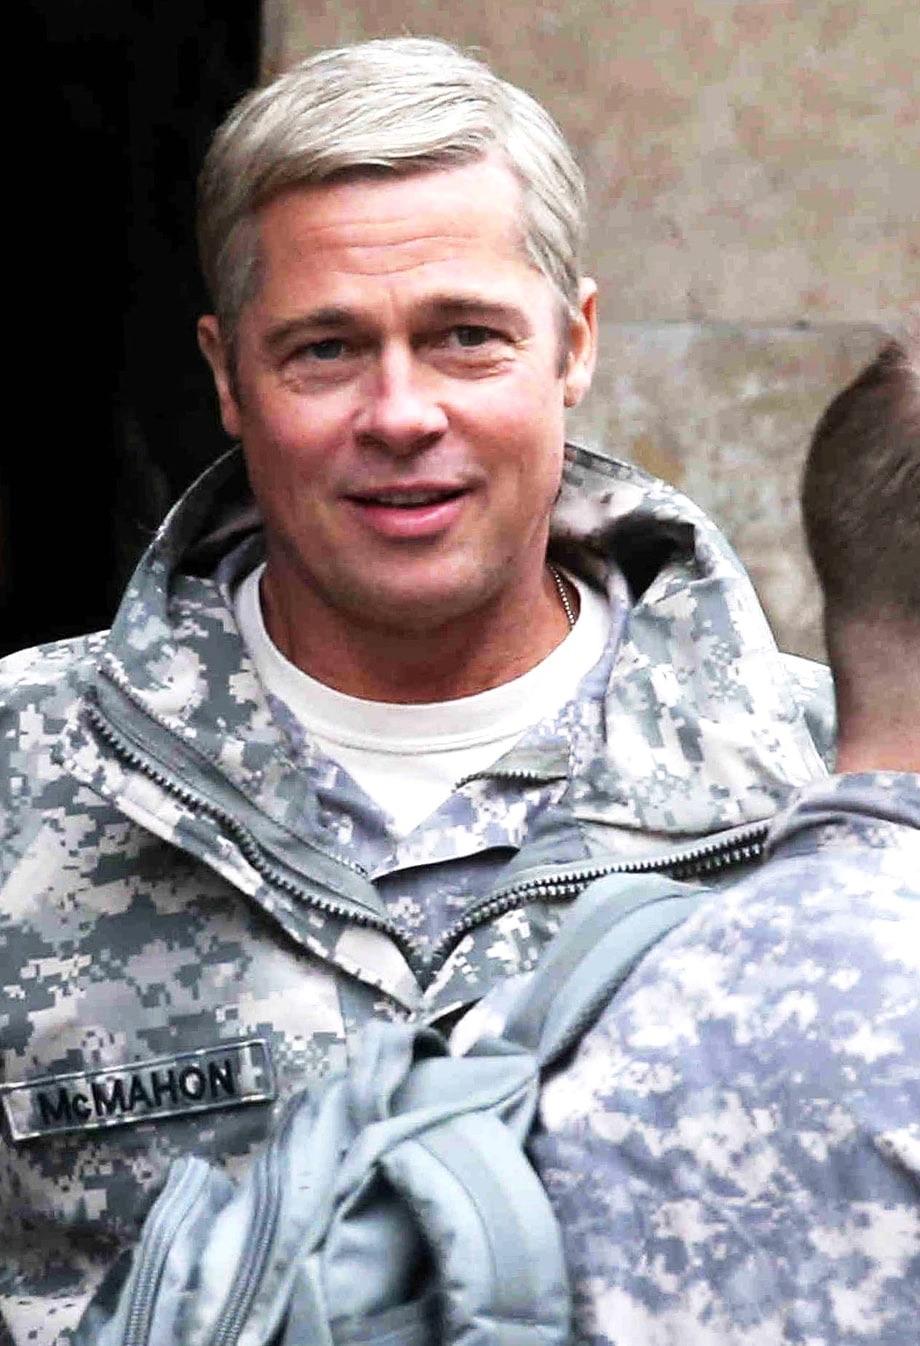 Brad Pitt is 'General Glenn McMahon' in the Netflix original film 'War Machine'.